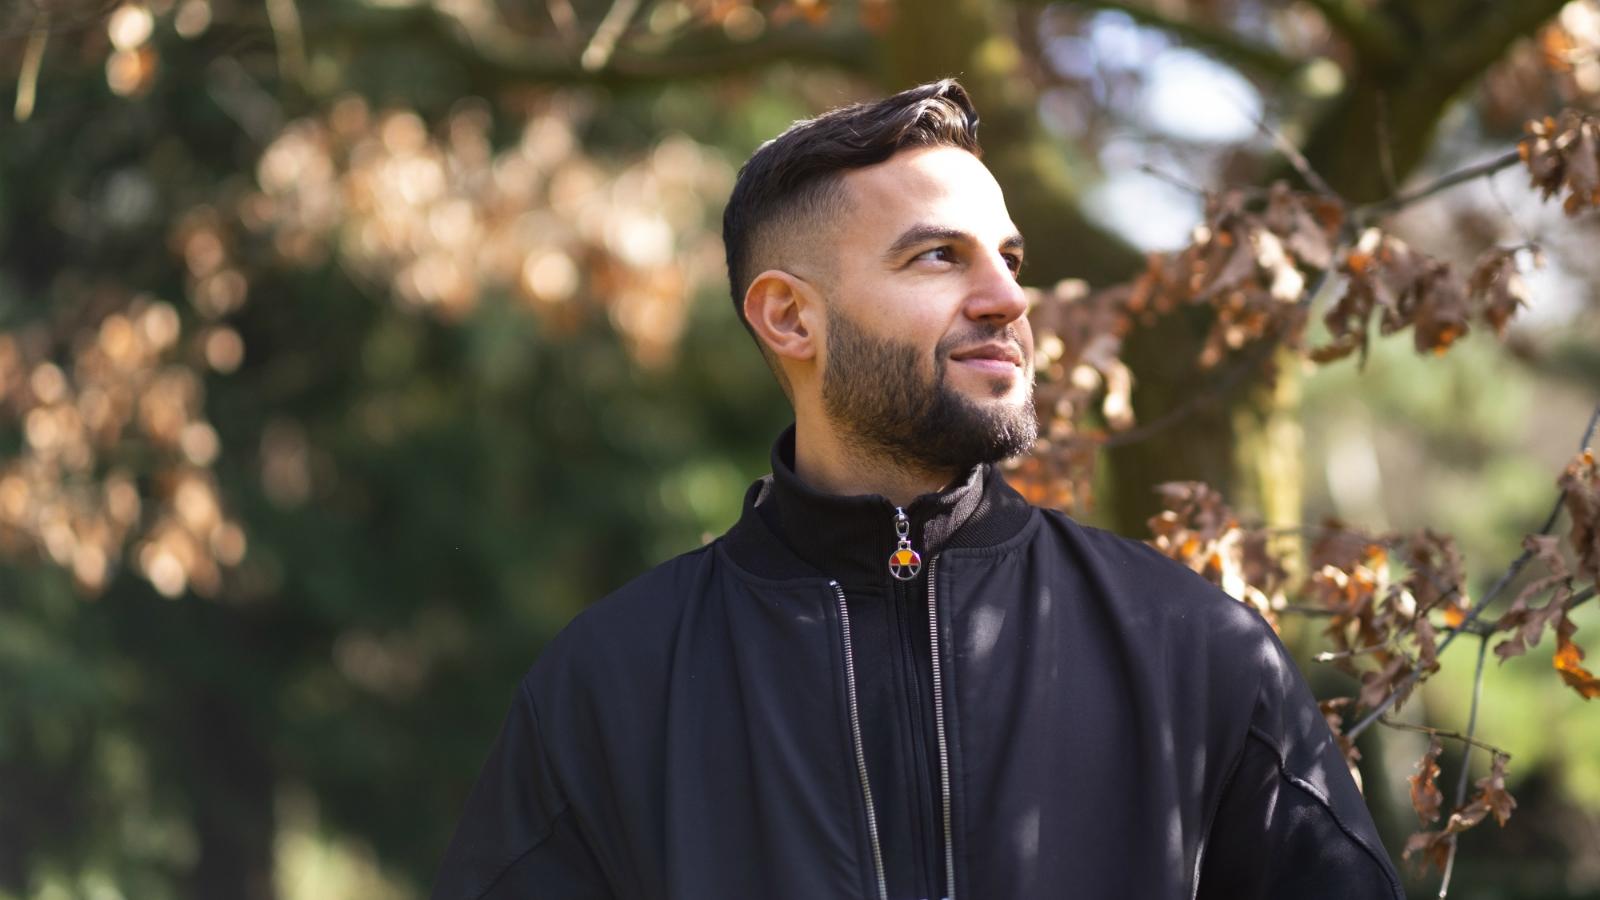 Ulaa Salim om den sprængfarlige 'Danmarks sønner': »Det er en antiekstrem film, selvom den fokuserer på det ekstreme«